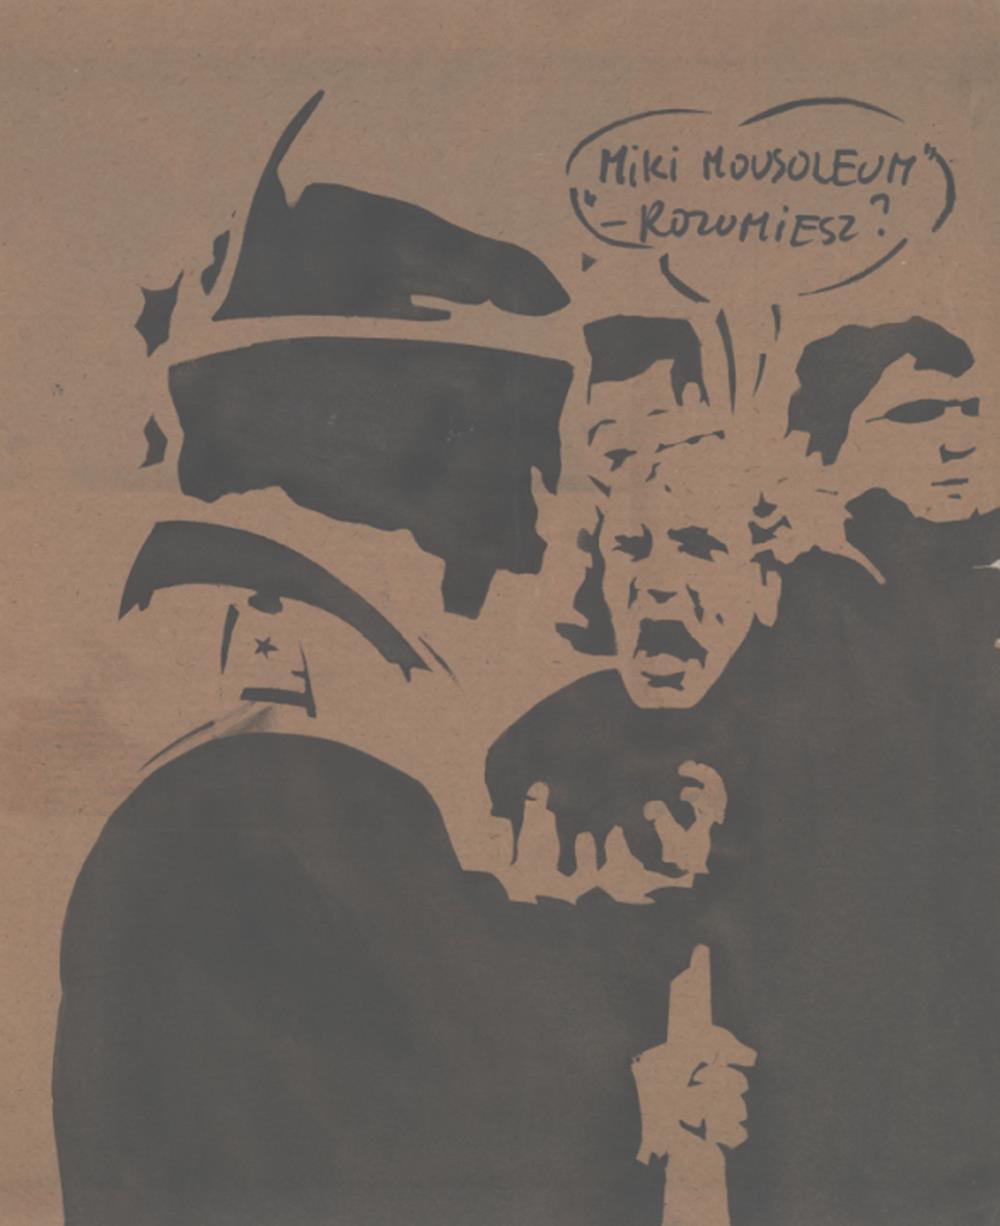 Jerzy Kosałka, Miki Mausoleum! Understand?, 1985, template on grey paper. Courtesy of the artist